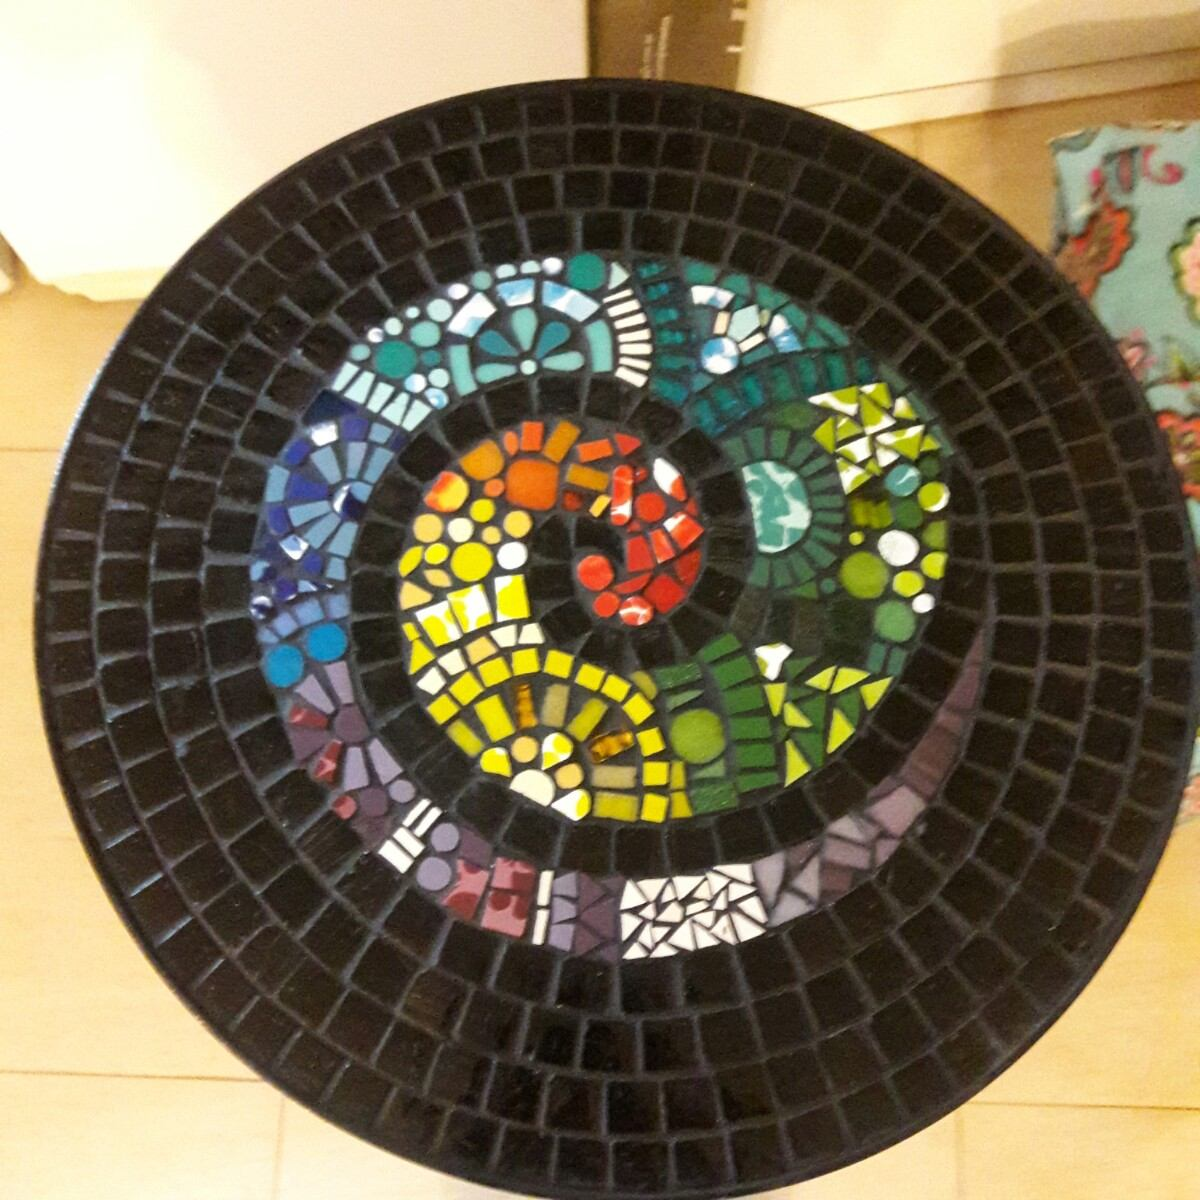 Mesas Mosaico Venecitas A Pedido Diseños - $ 2.500,00 en Mercado Libre